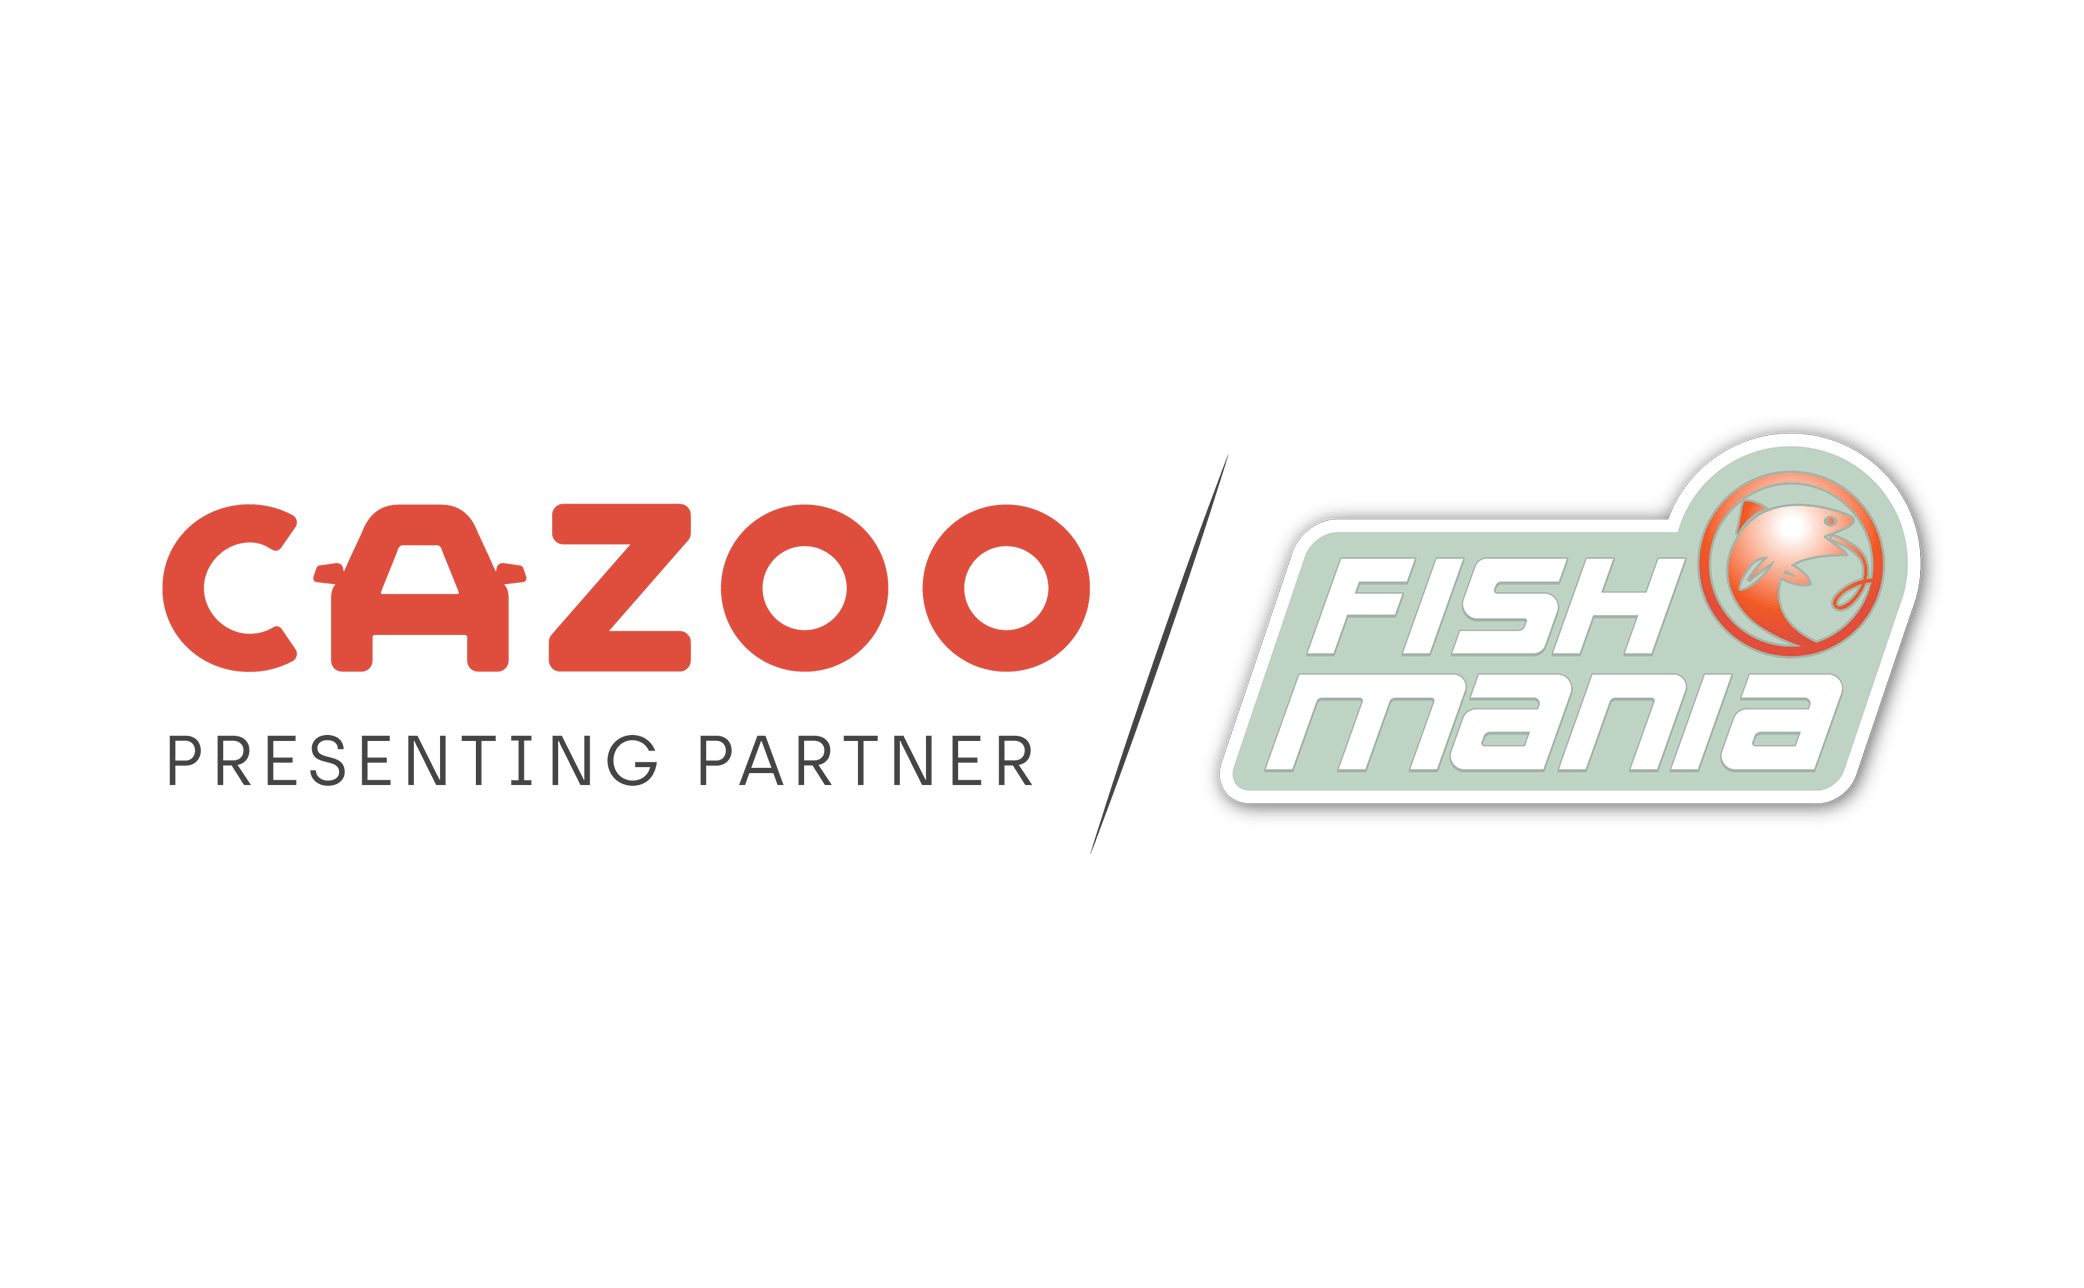 Fish 'O' Mania Sponsorship